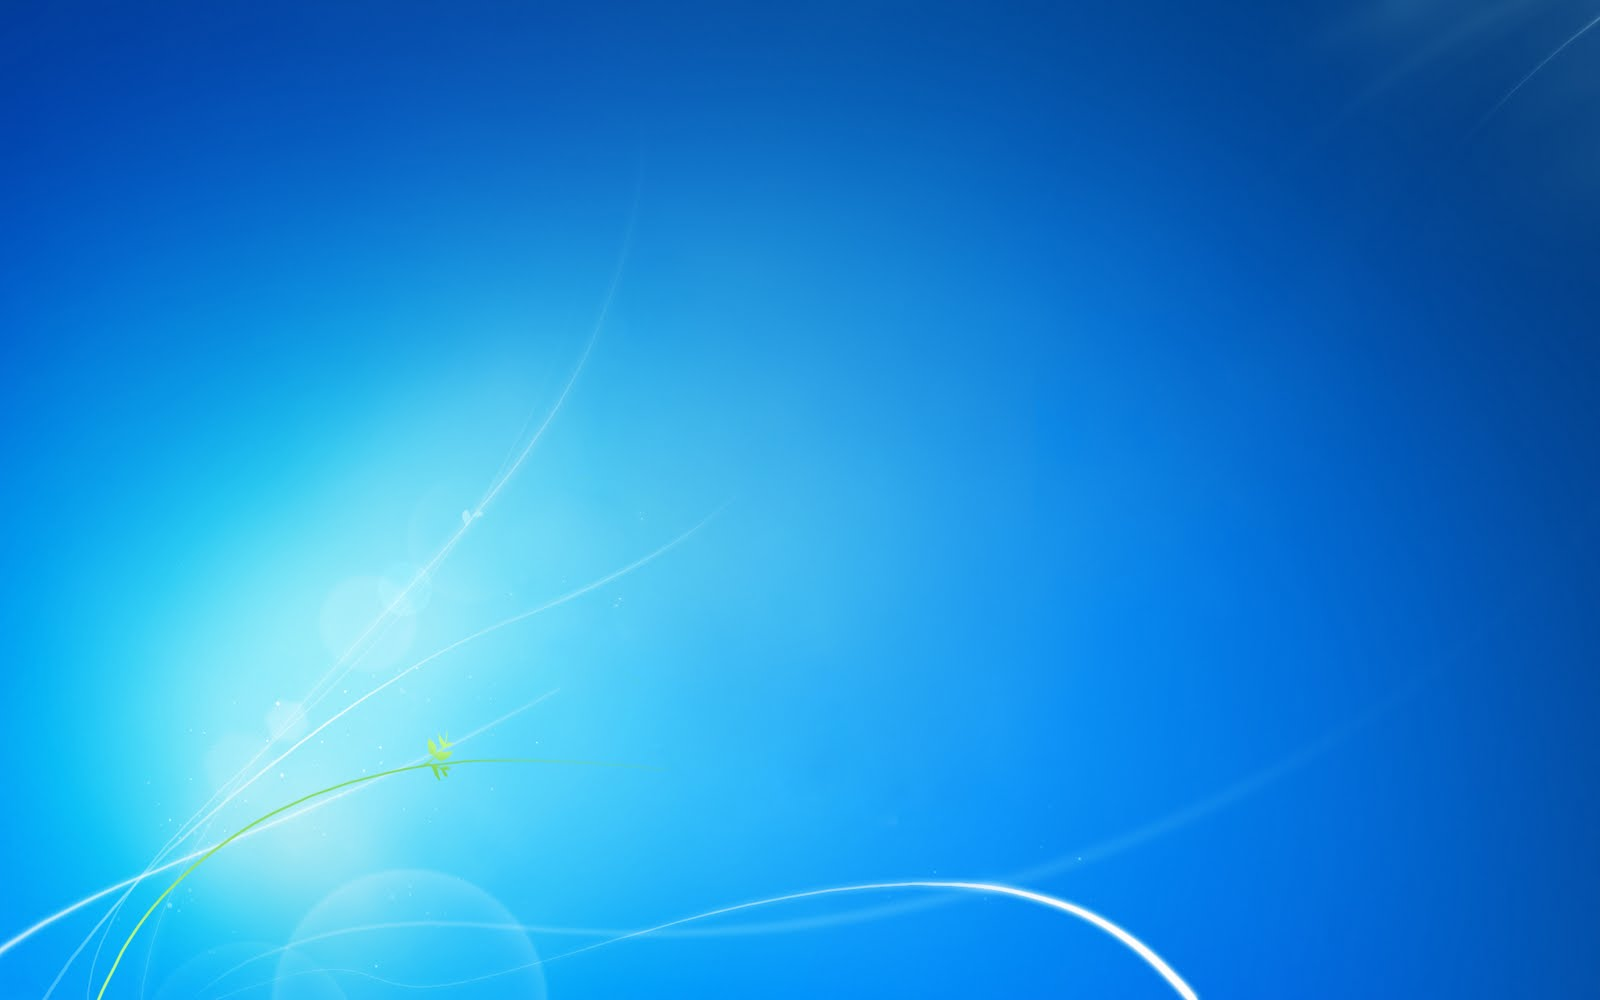 wallpaper Windows 7 No Logo Clean Blue HD Wallpapers 1600x1000